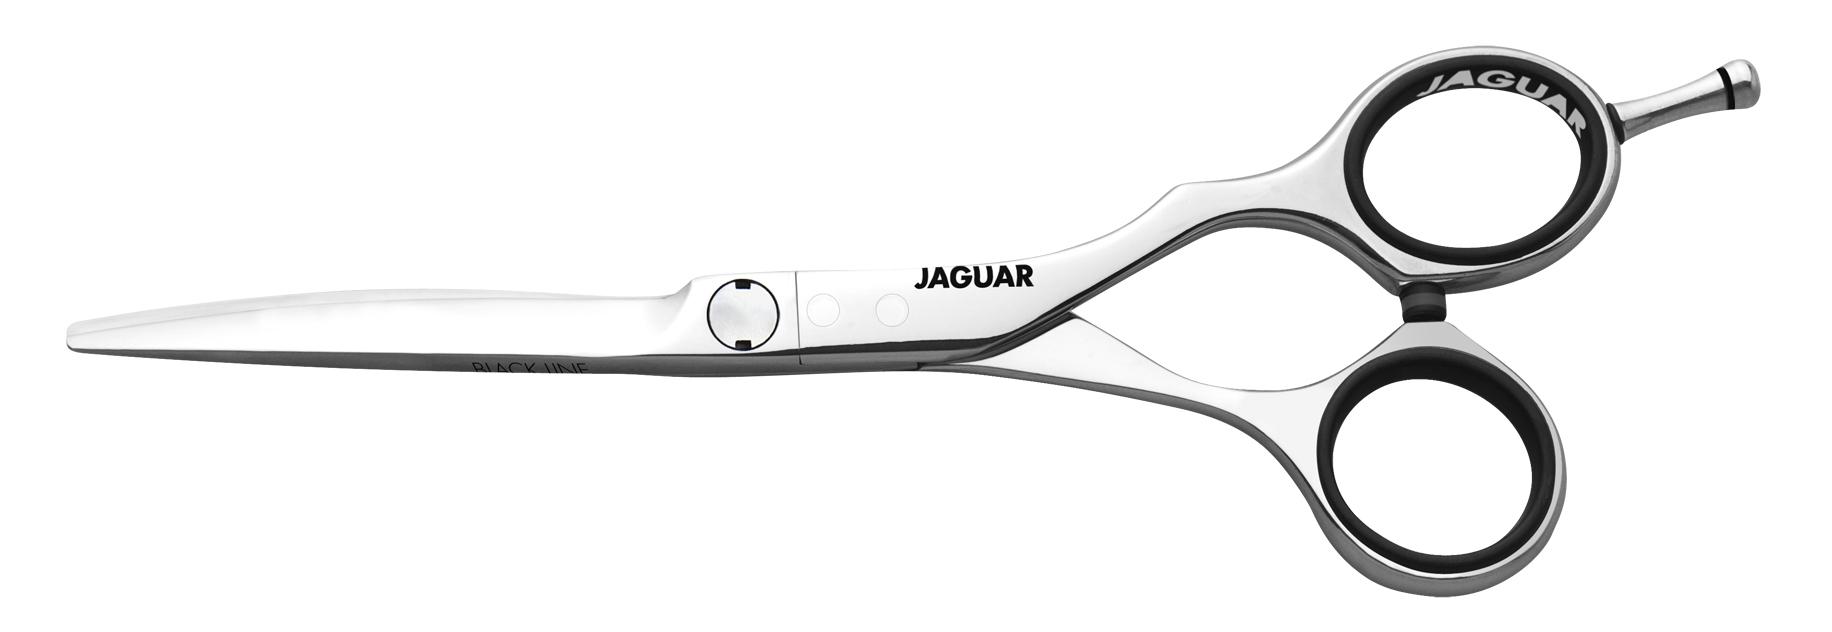 JAGUAR Ножницы A Evolution 6' ***** jaguar ножницы a evolution 2 вида ножницы a evolution 2 вида 1 шт 94575 a evolution 5 75